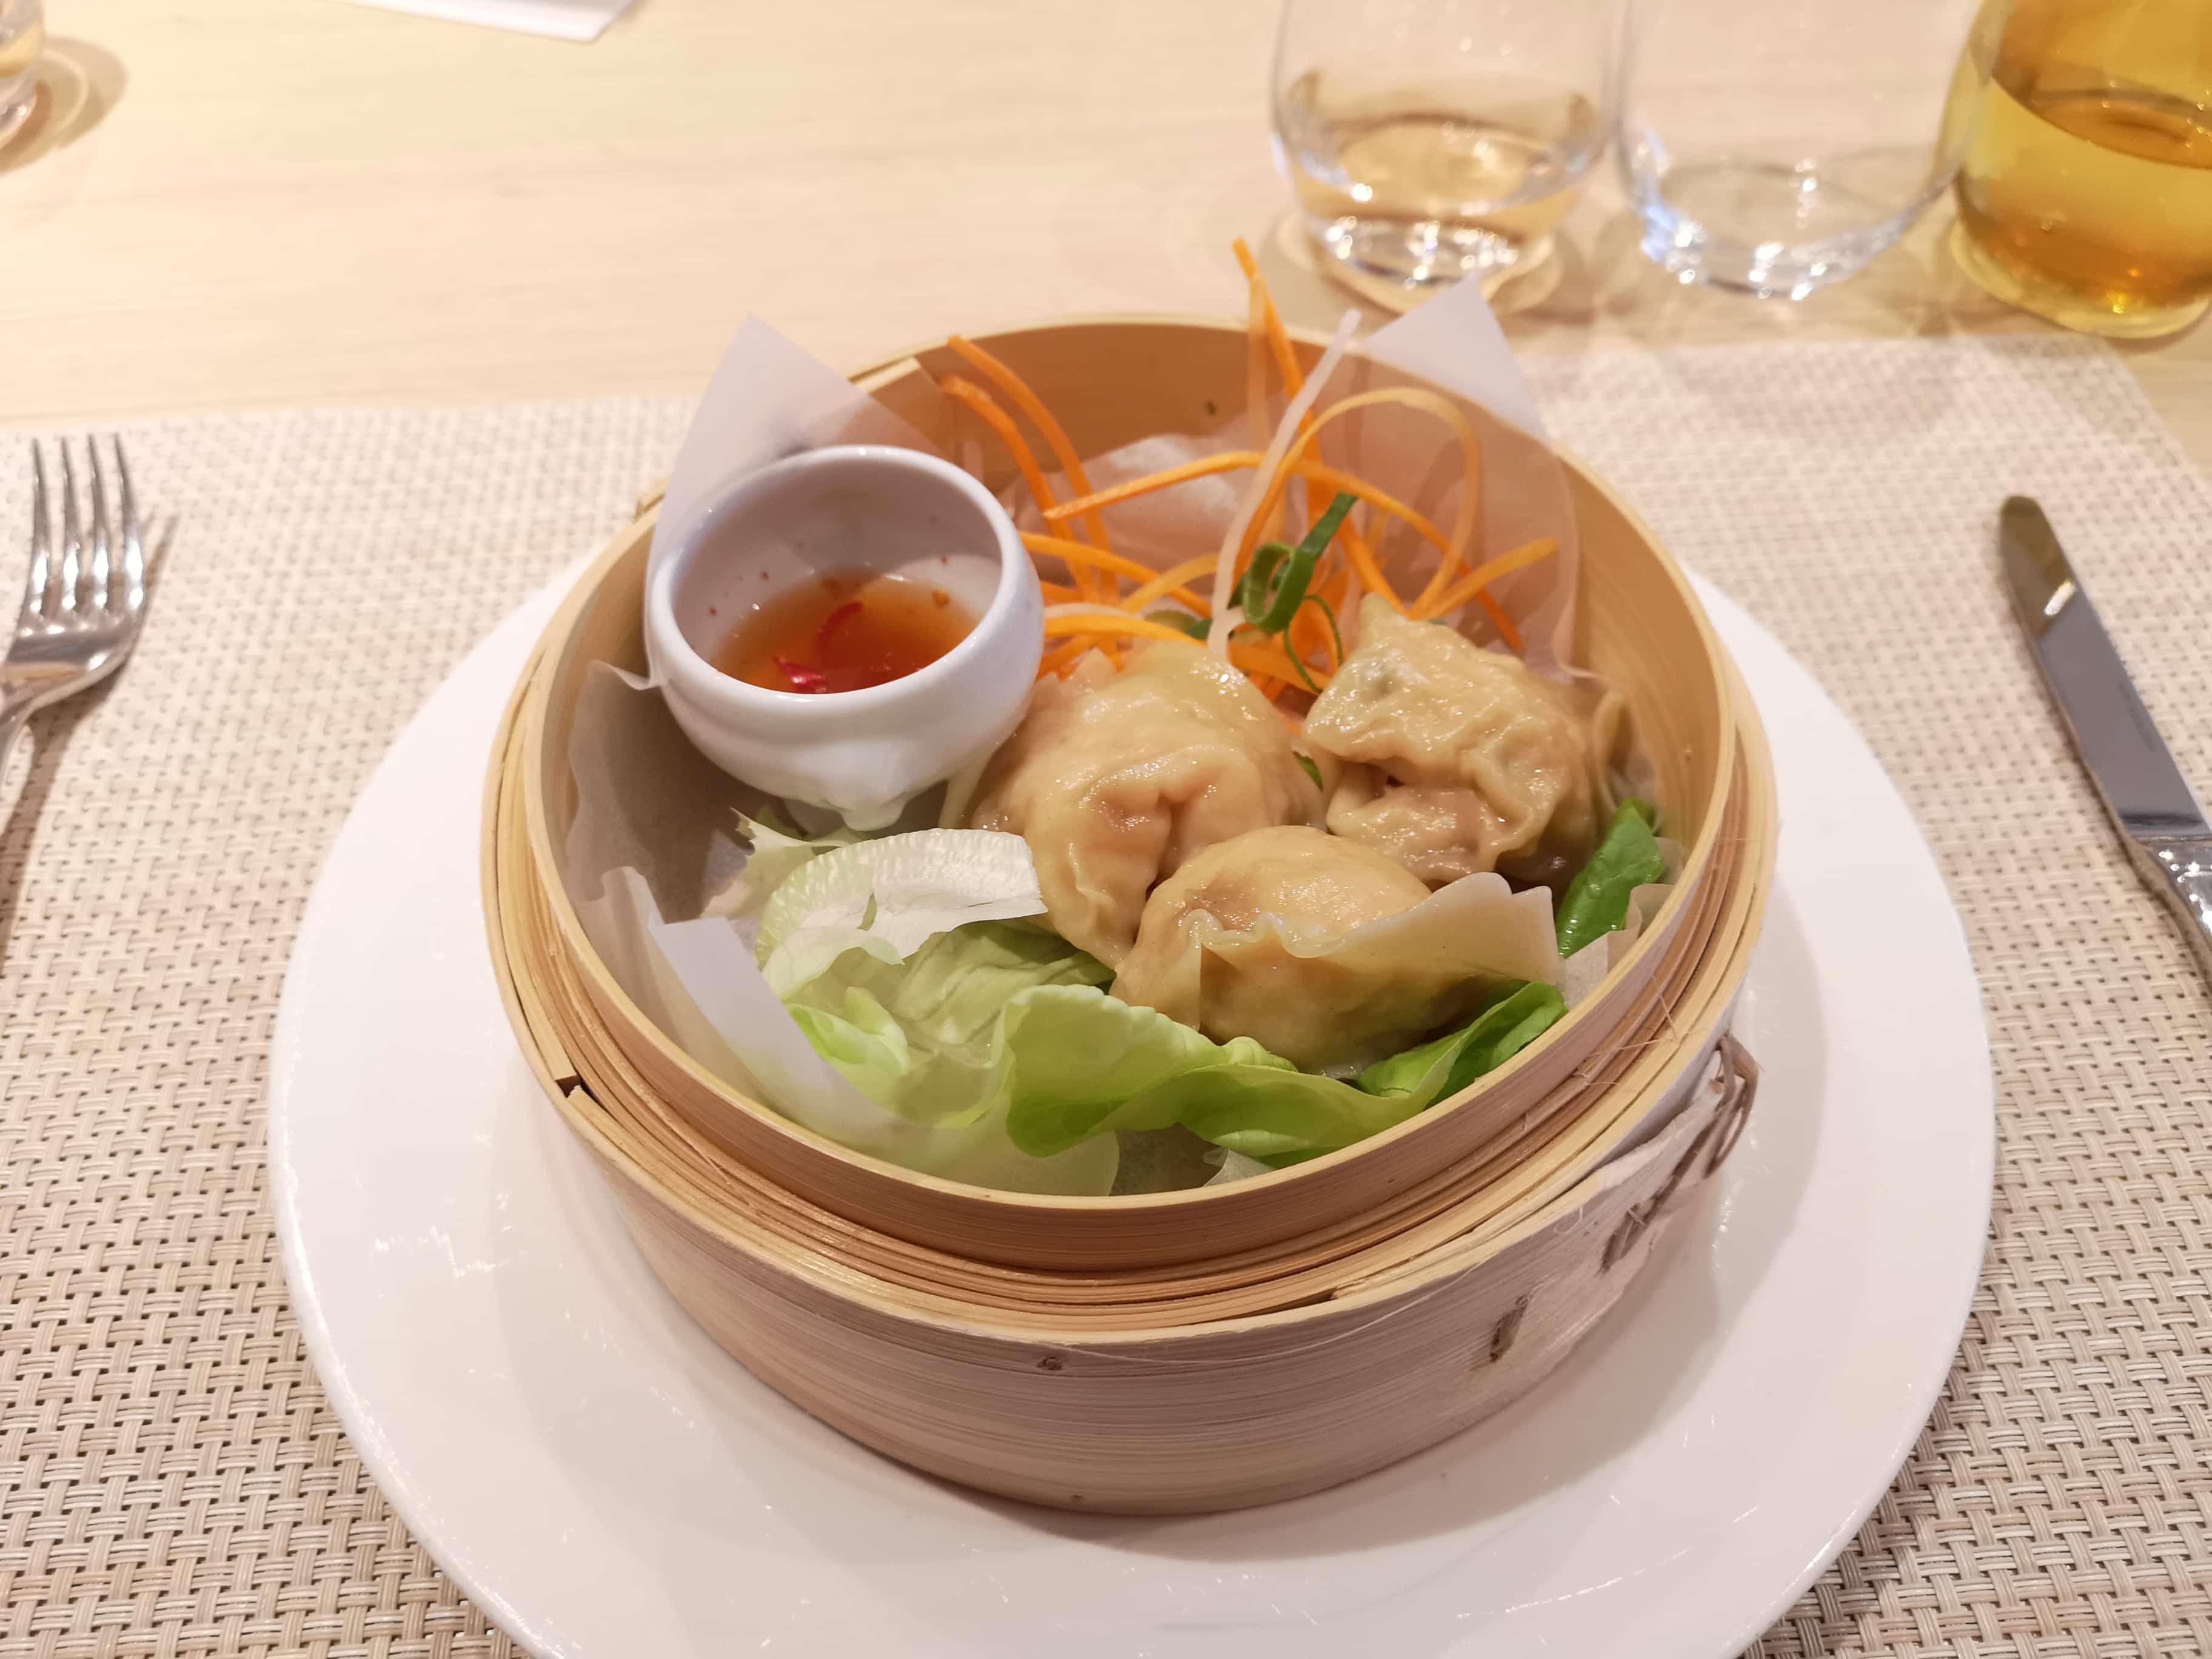 Viking Sea Cruises - Chefs Table - Lobster Dumplings